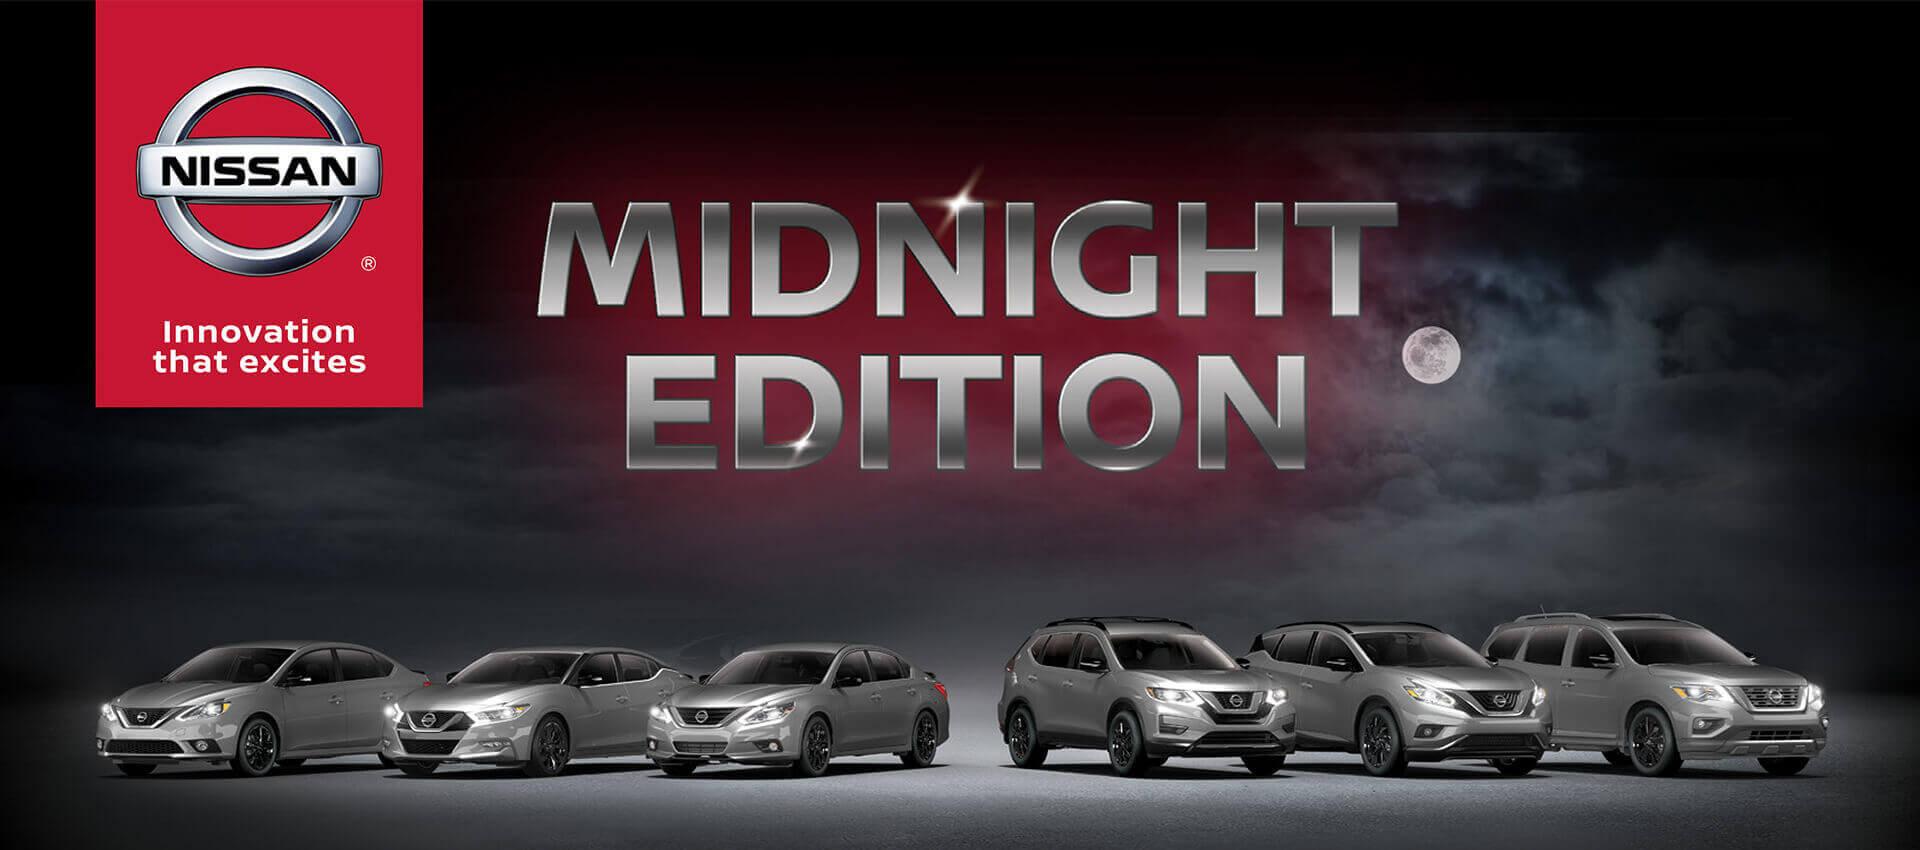 Midnight Edition